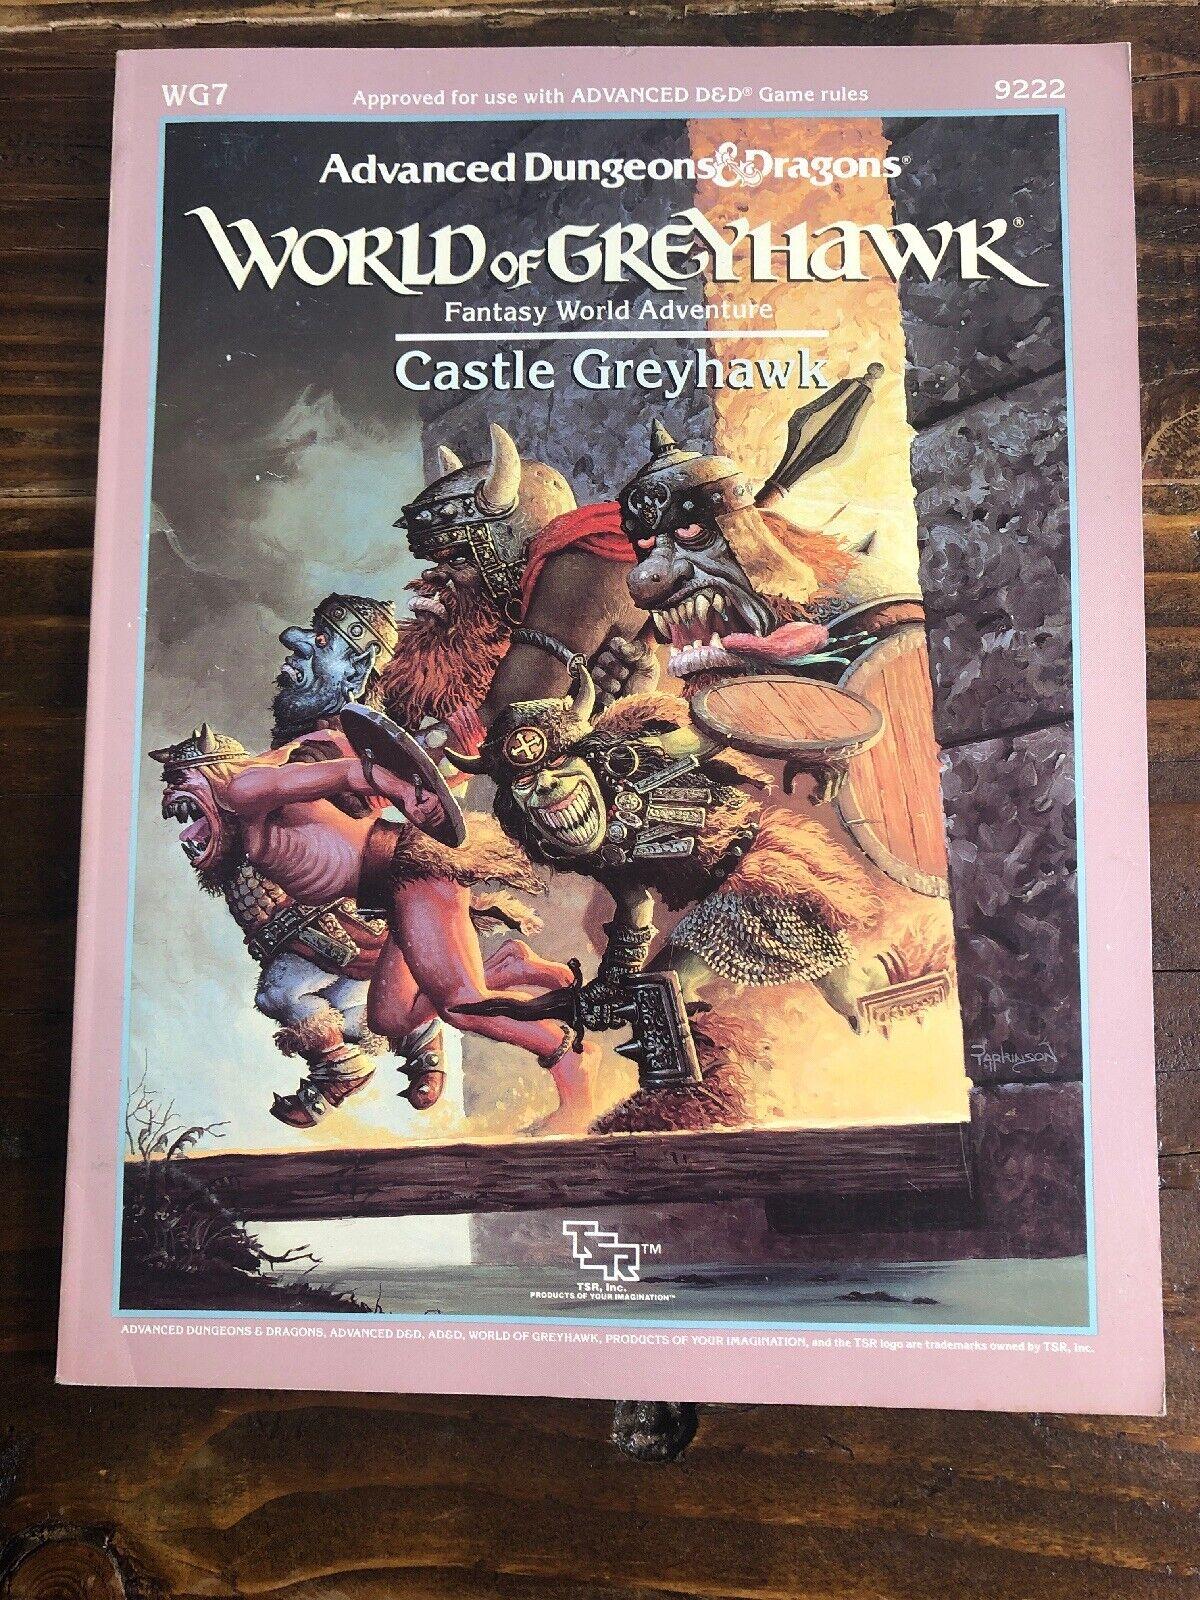 ADVANCED D&D -World of Greyhawk- MODULE WG7 CASTLE GREYHAWK - Vintage TSR 9222